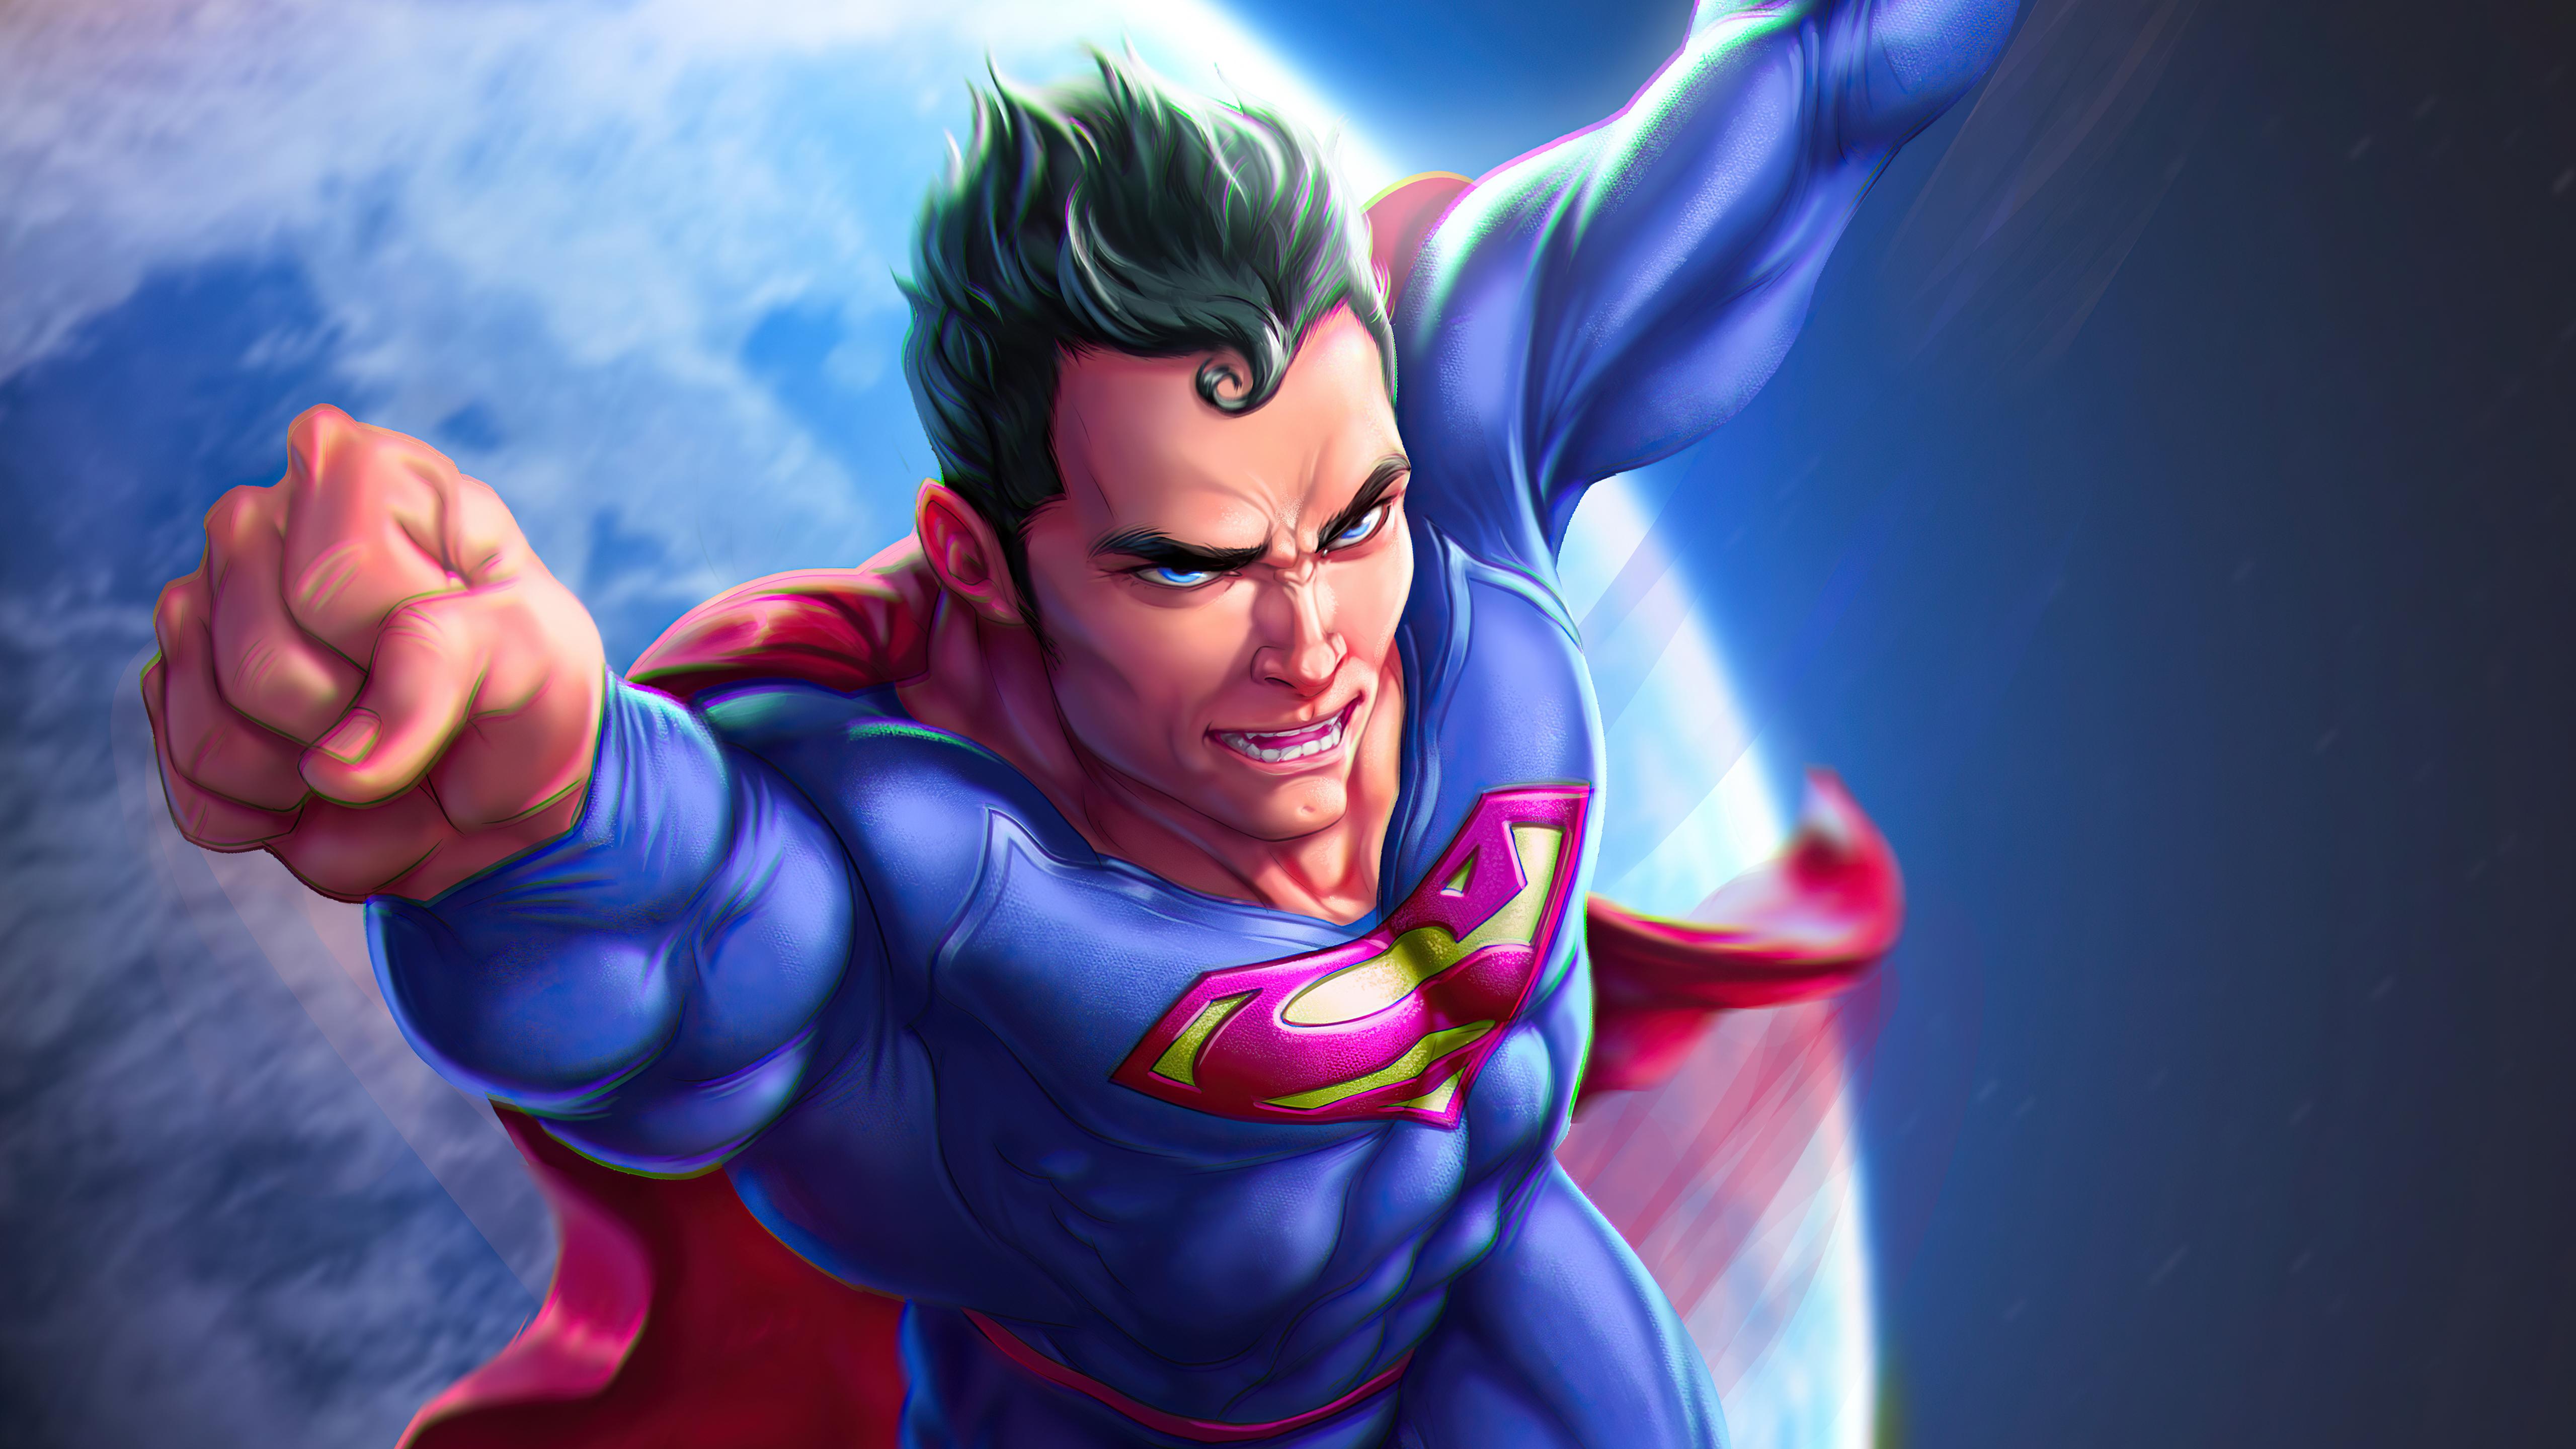 Fondos de pantalla Superman Fuera del mundo